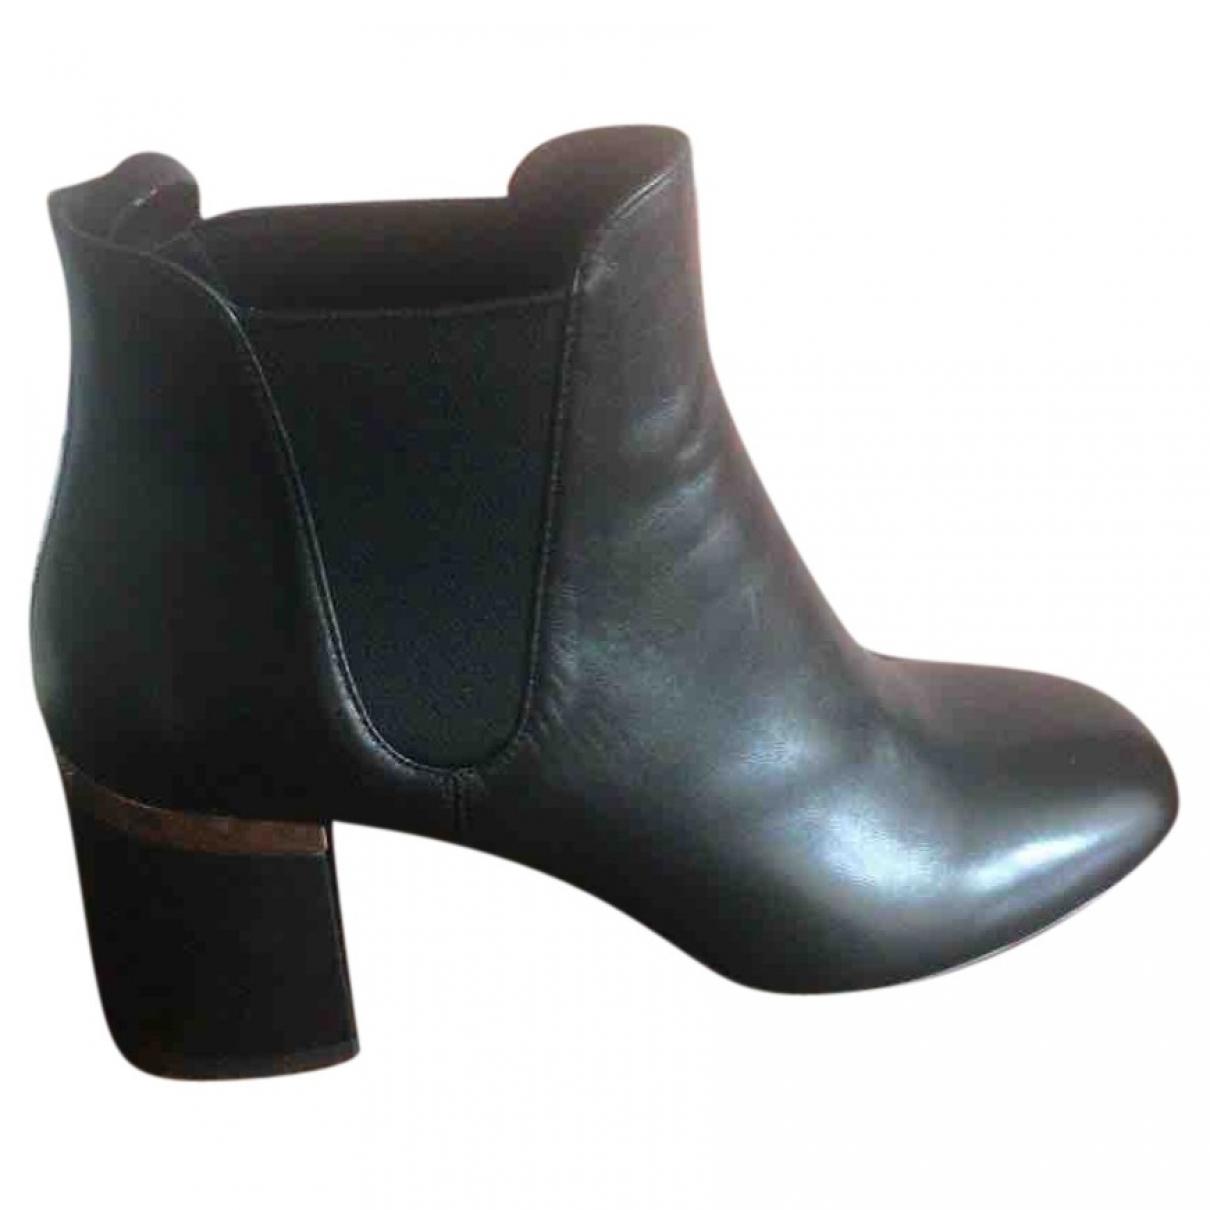 Miu Miu \N Black Leather Ankle boots for Women 36 EU